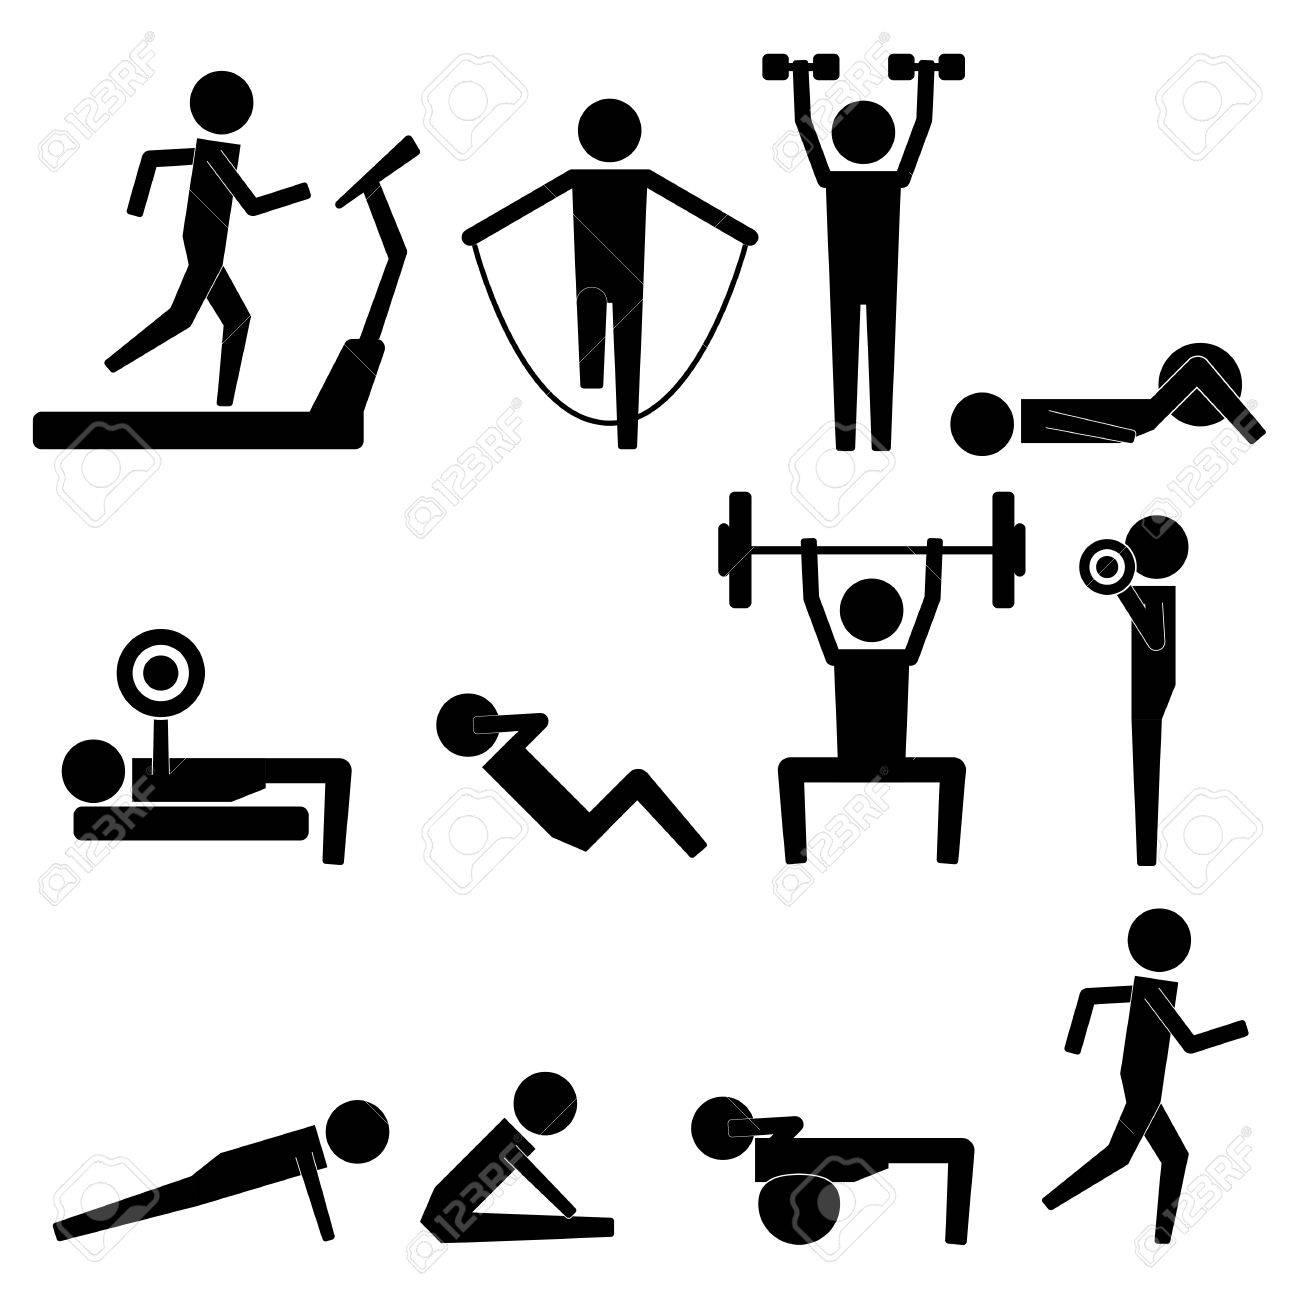 Human Stick Figure Body Exercise Icon Symbol Sign Pictogram - 51919684